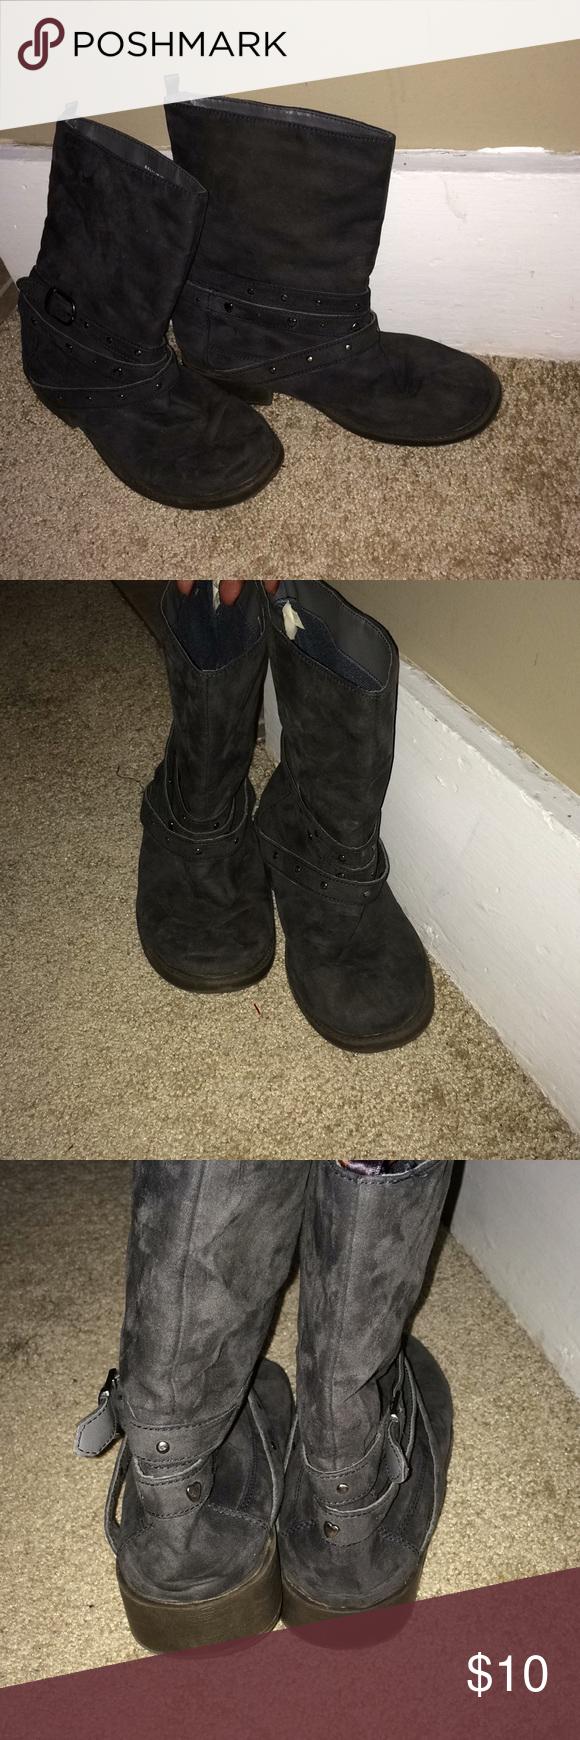 710b01a1dc58 Girls boots size 4